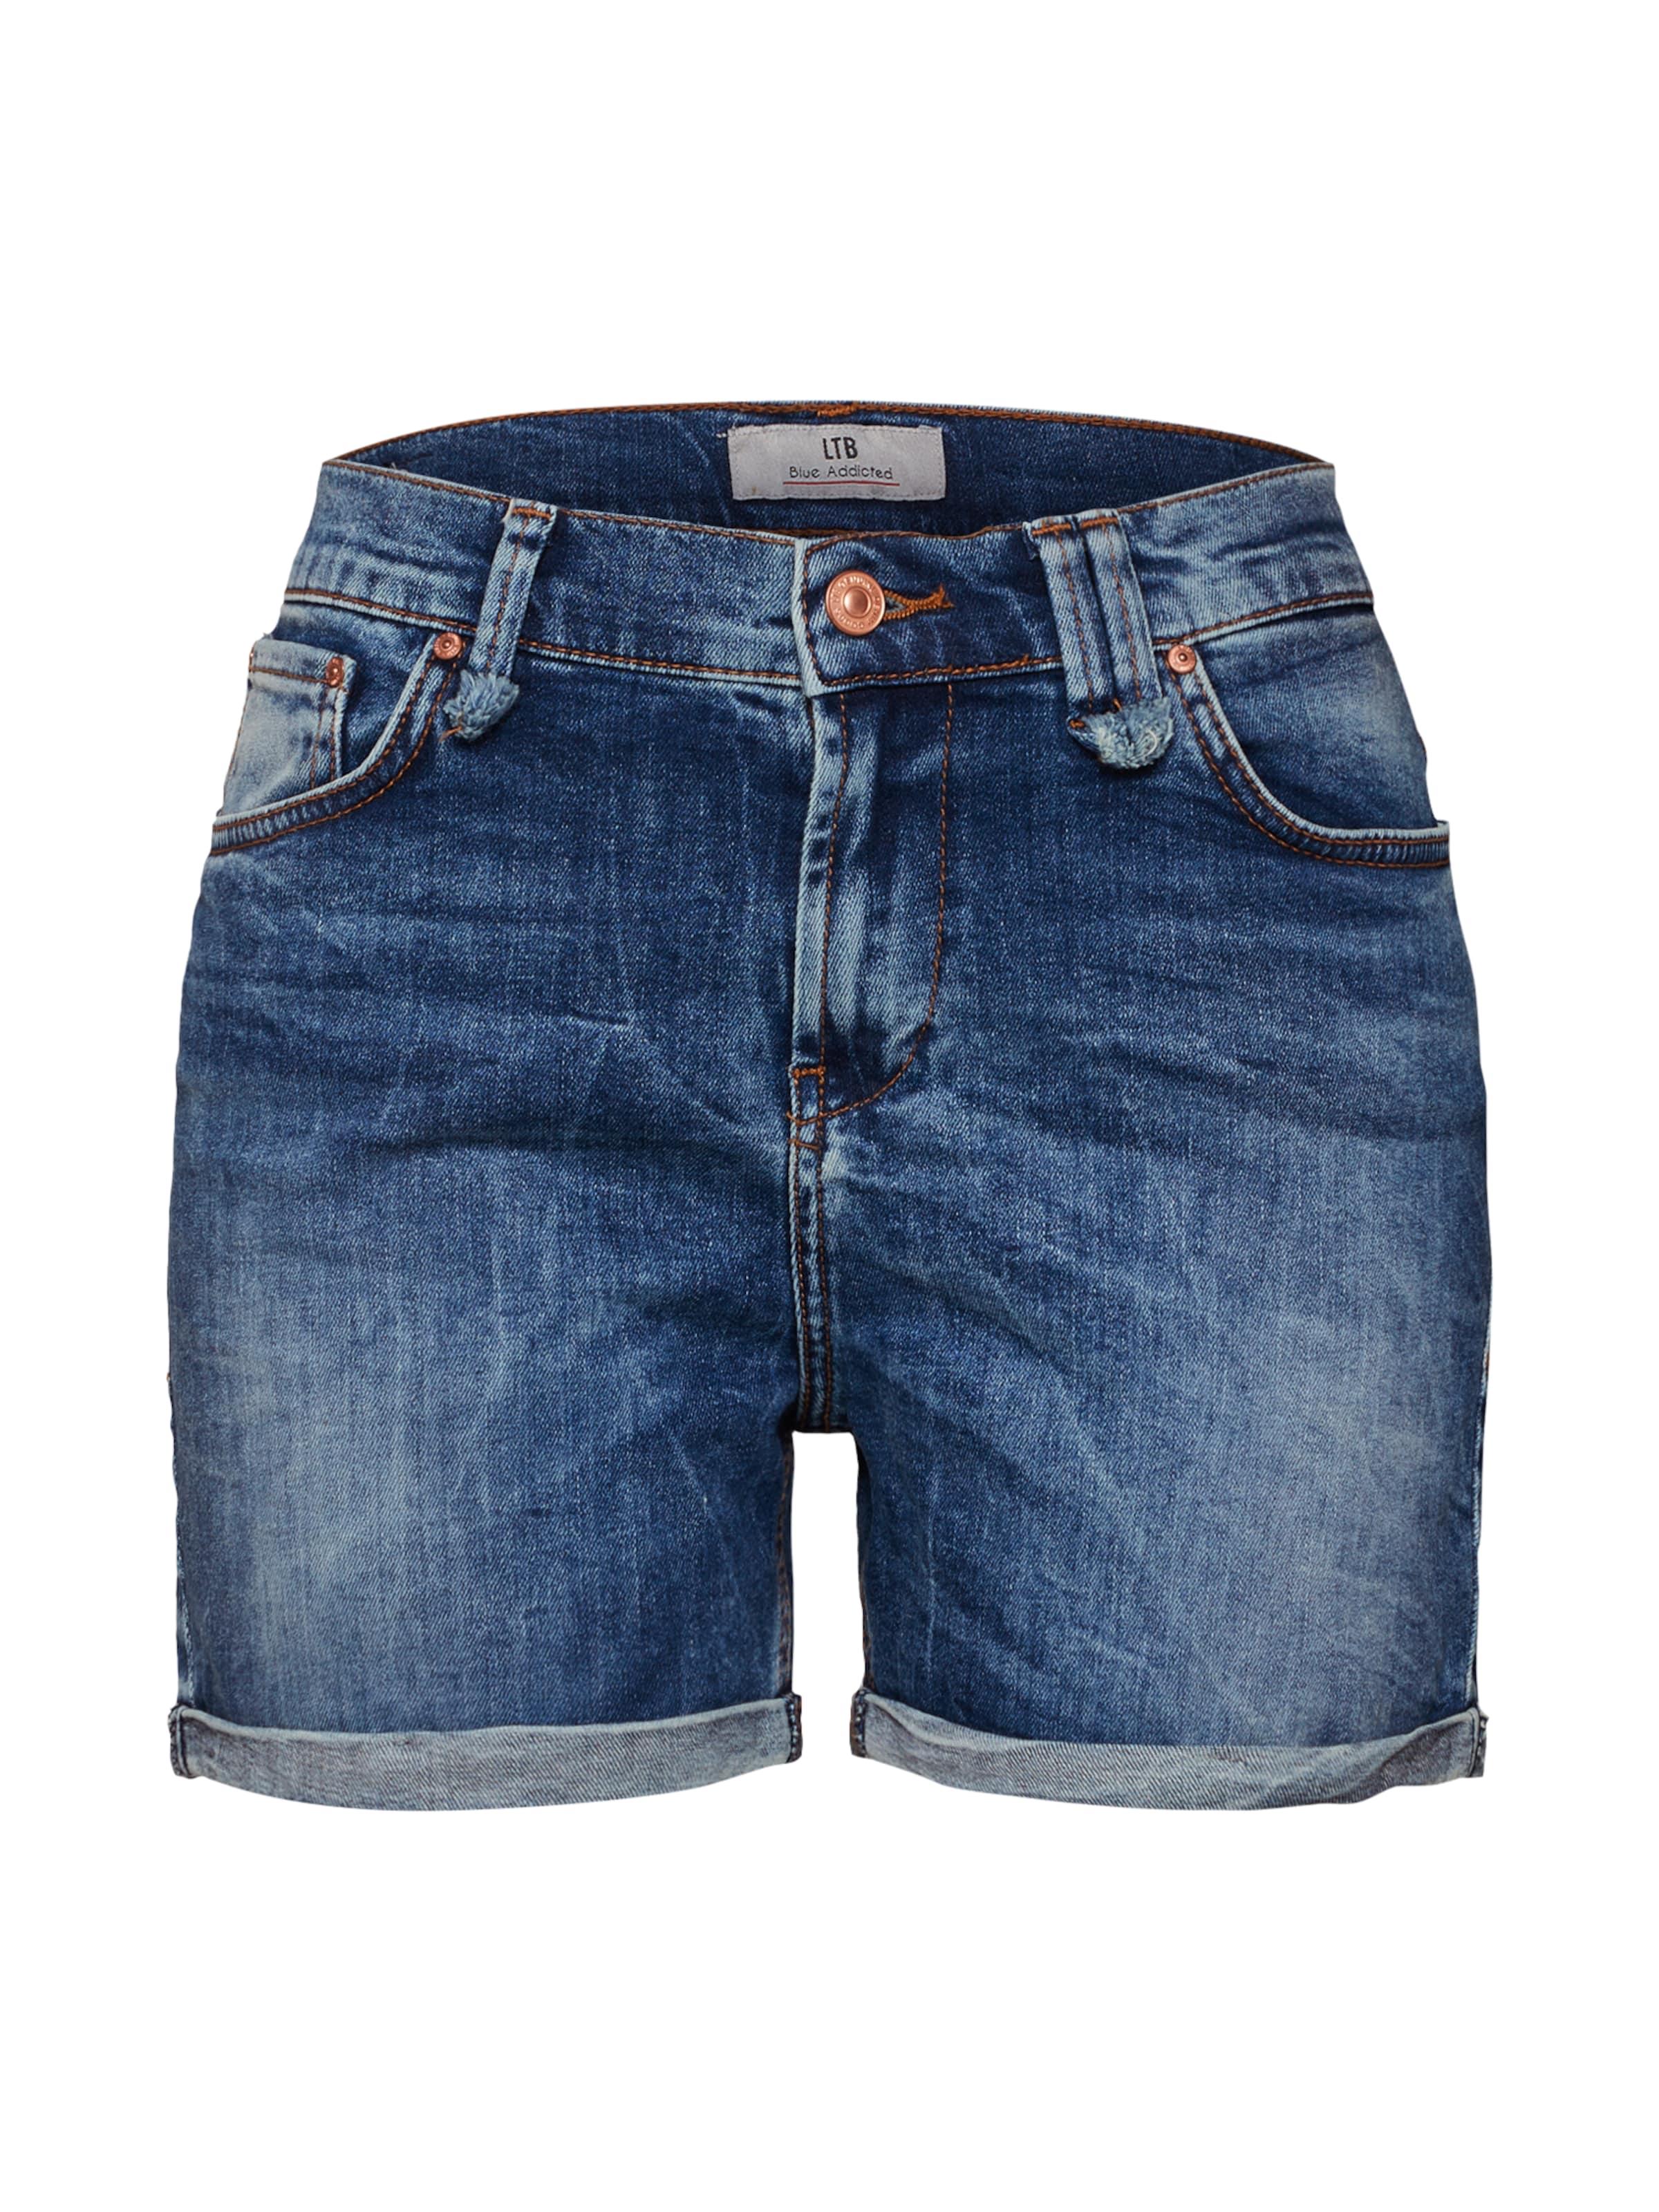 Ltb Jeans Denim In 'milenabermuda' Blauw m0vNnw8